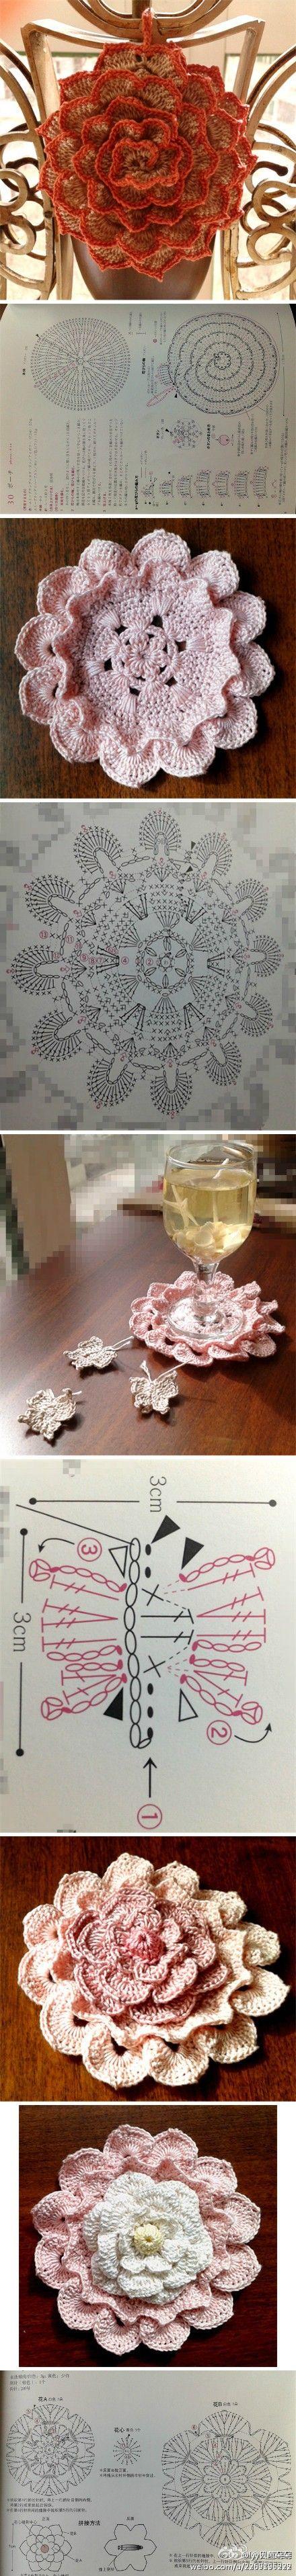 Art GALA handmade crochet crochet life